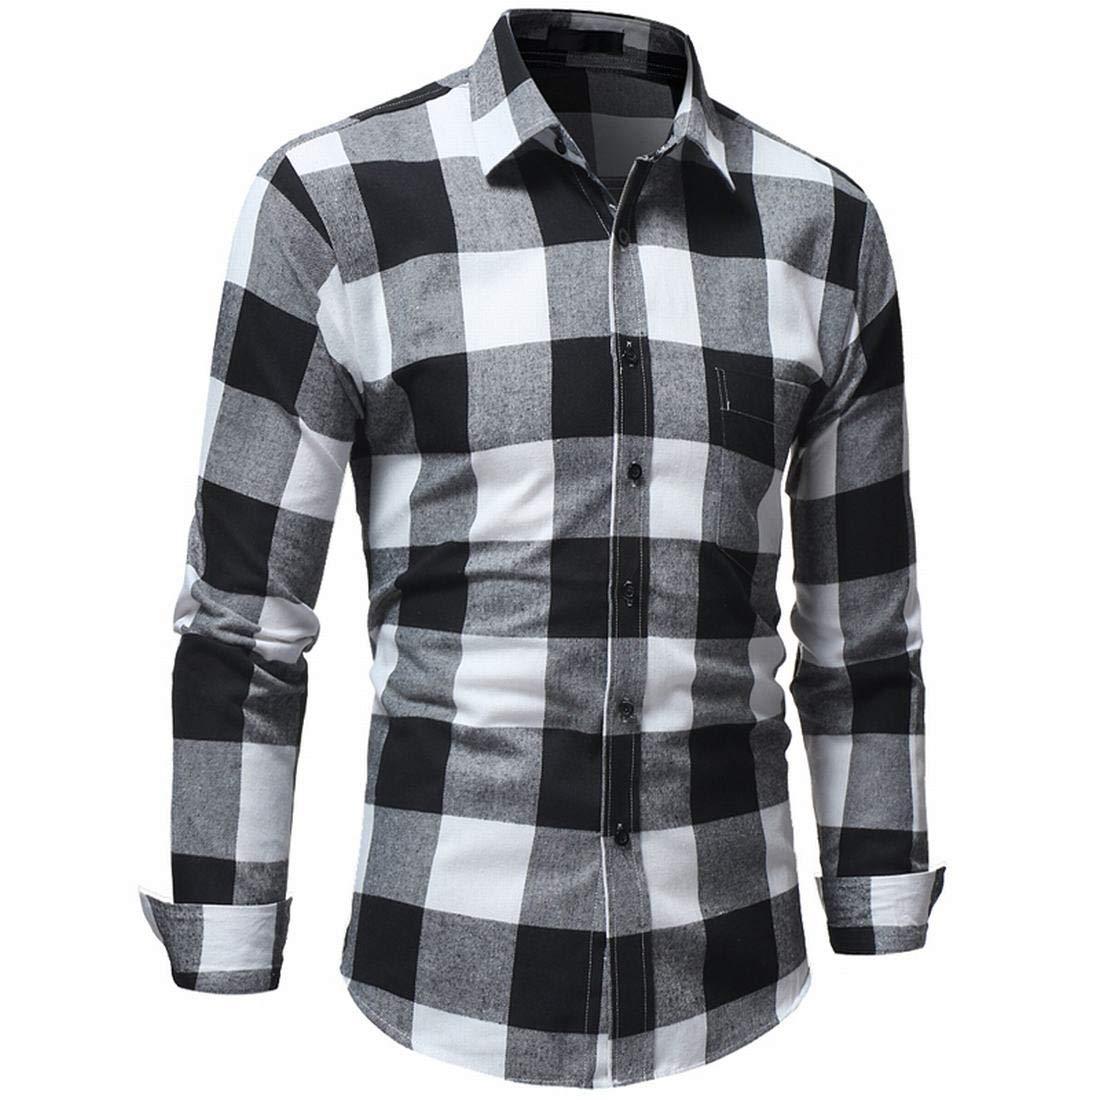 ZAWAPEMIA Mens Slim Fit Button Down Long Sleeve Plaid Shirts